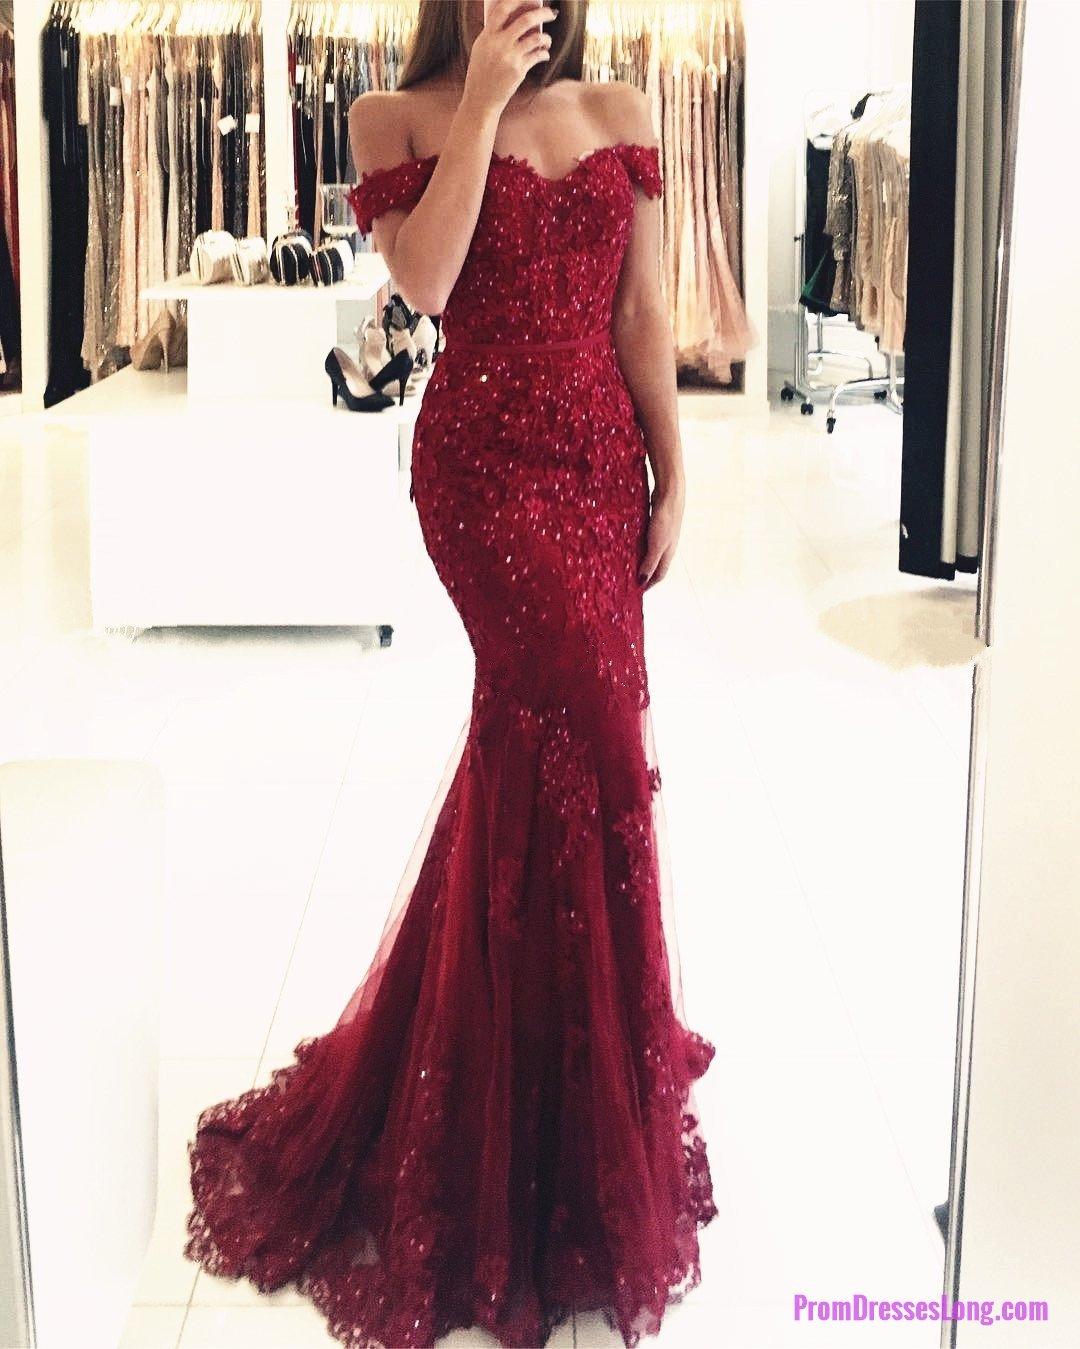 Burgundy prom dressesmermaid evening dresslace evening gowns